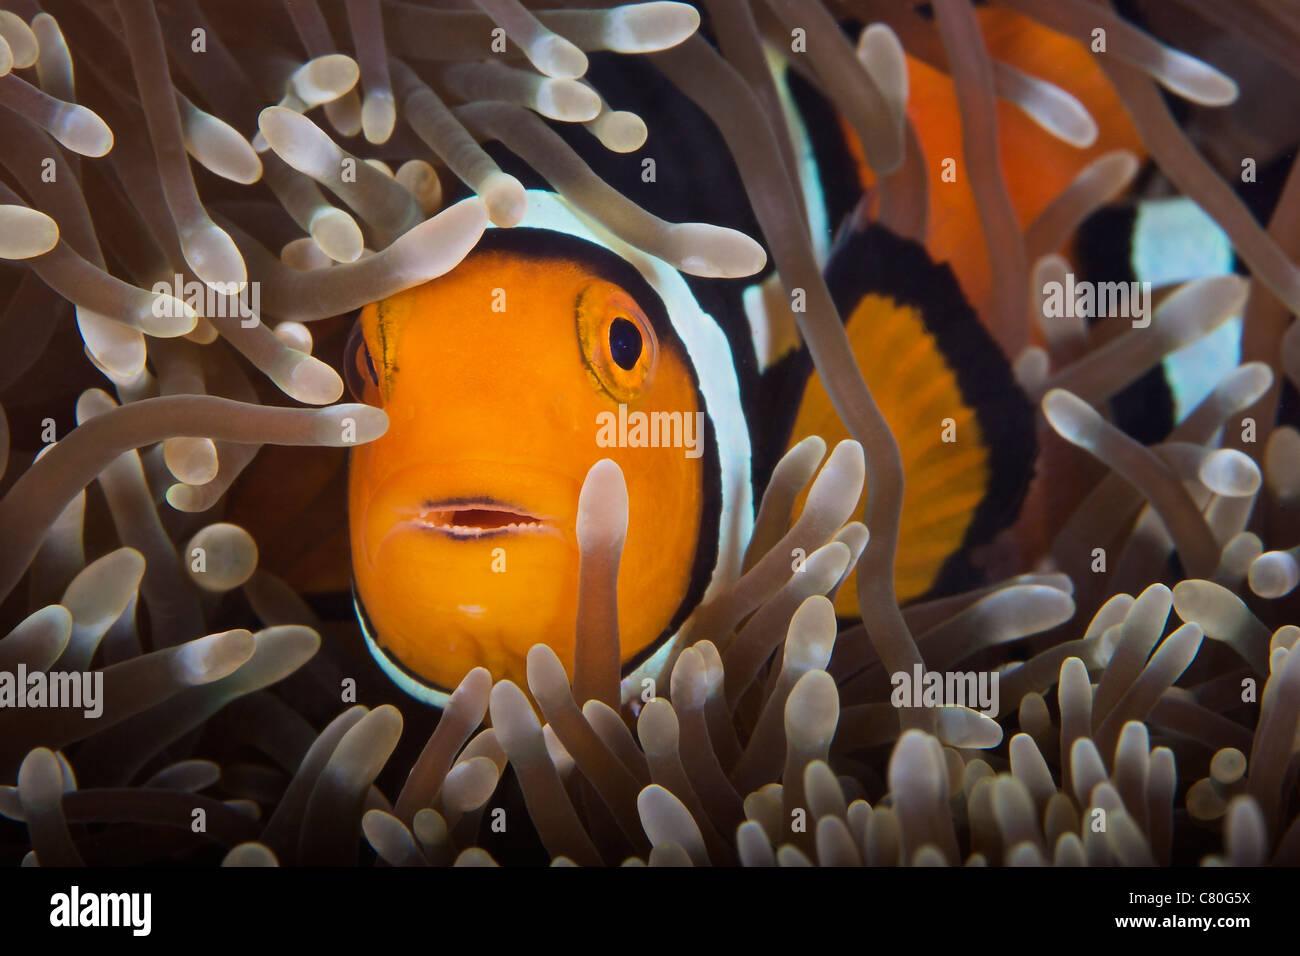 Percula Clownfish in its host anemone, Papua New Guinea. - Stock Image